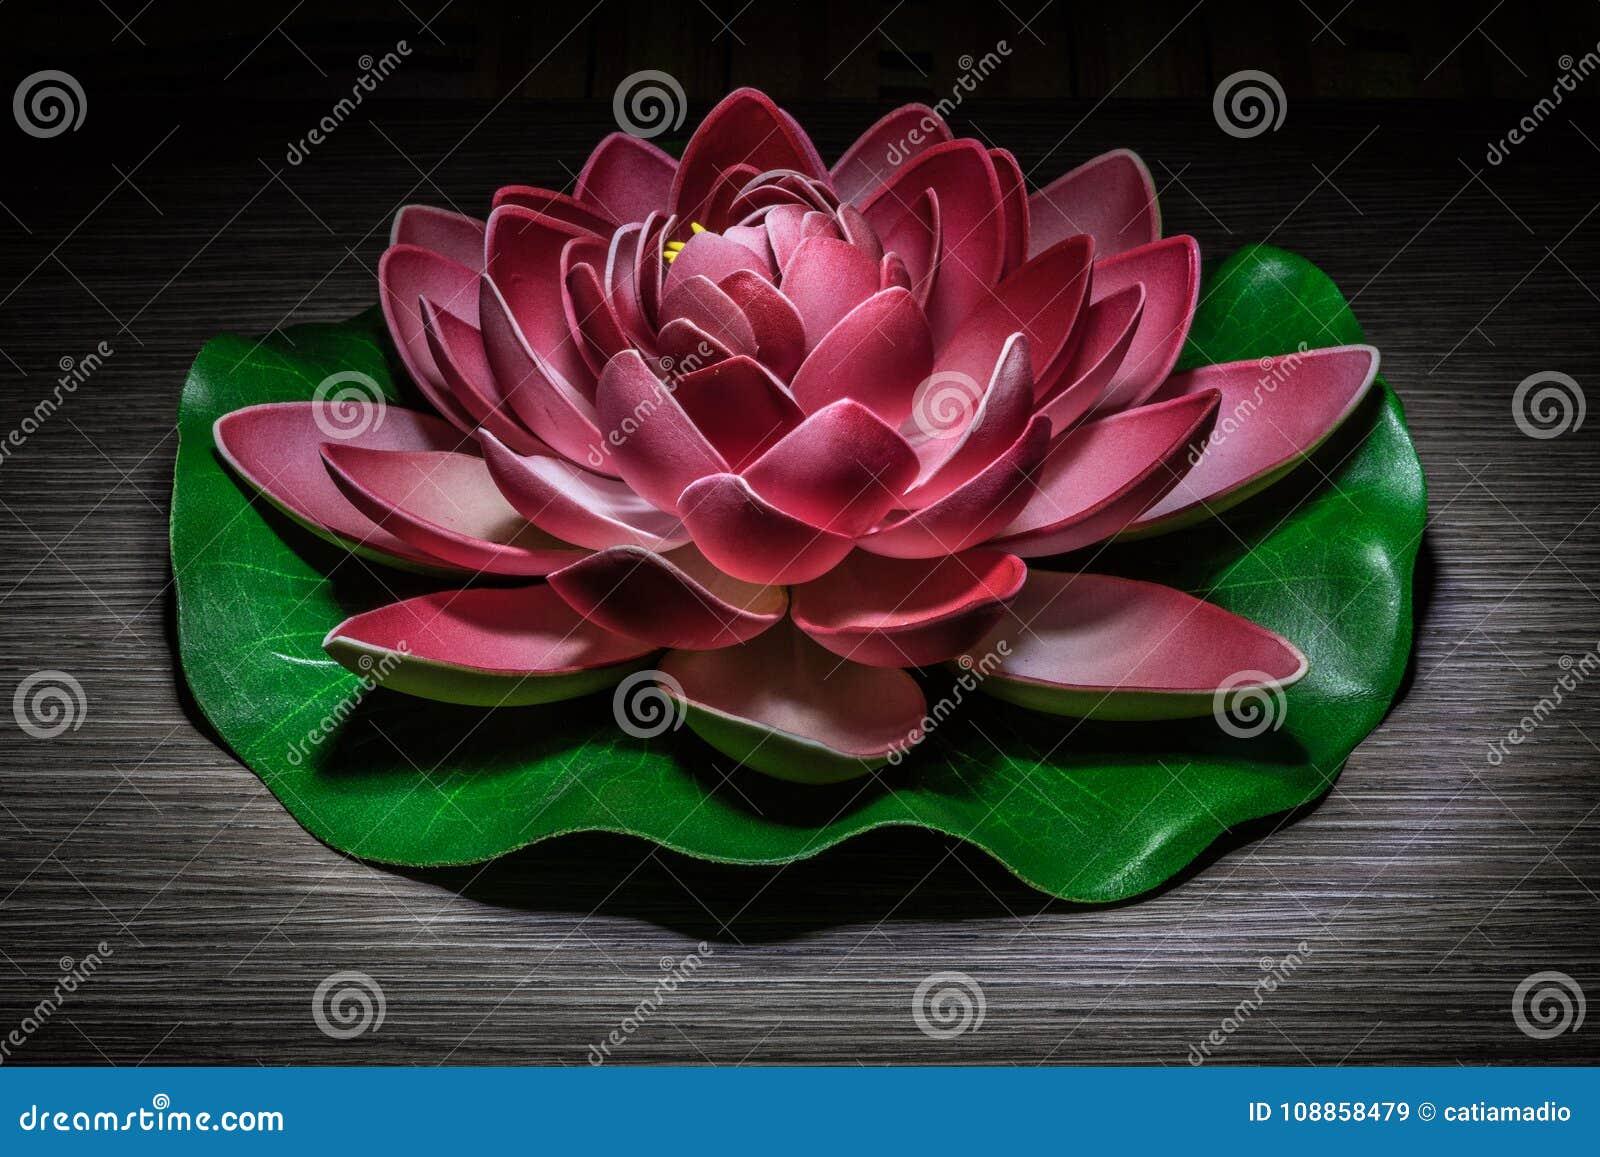 Ornamental lotus light painting stock image image of water ornamental lotus light painting izmirmasajfo